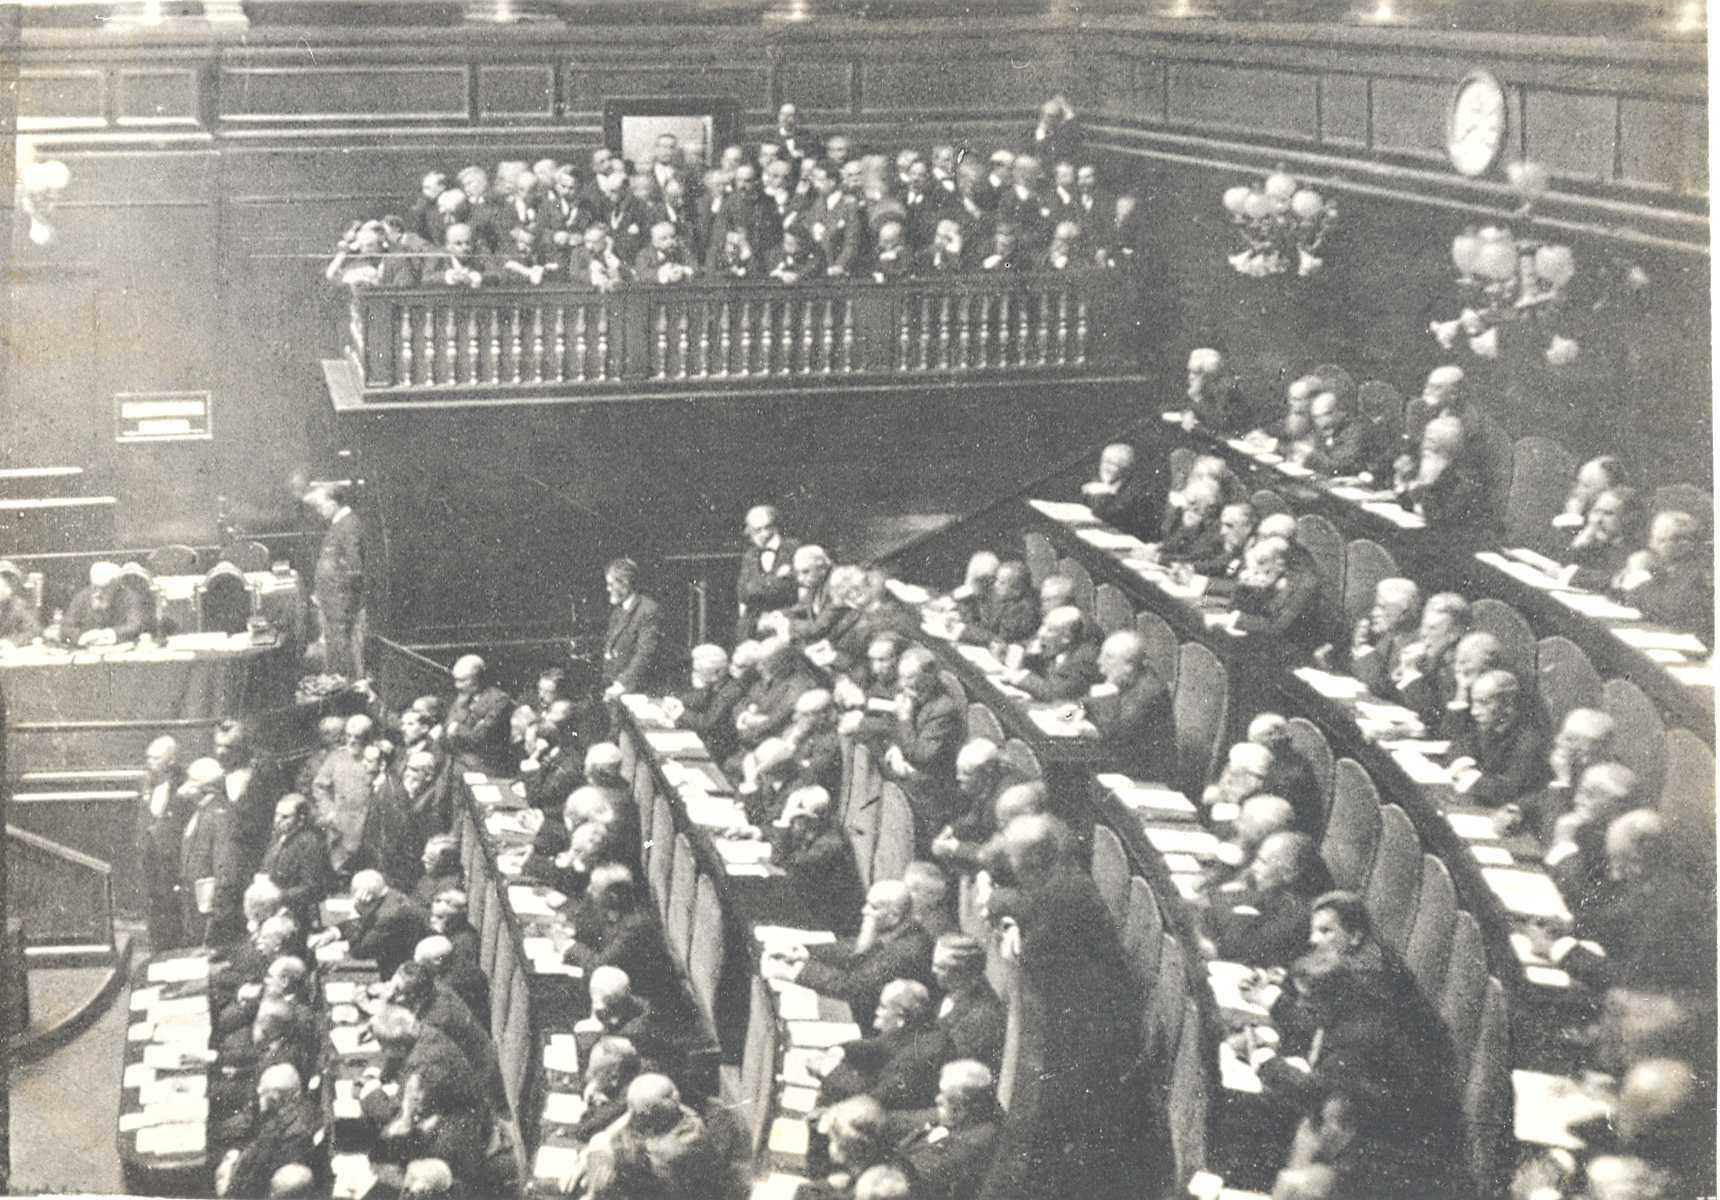 La camera dei deputati e la guerra 1915 1918 for Biblioteca camera dei deputati